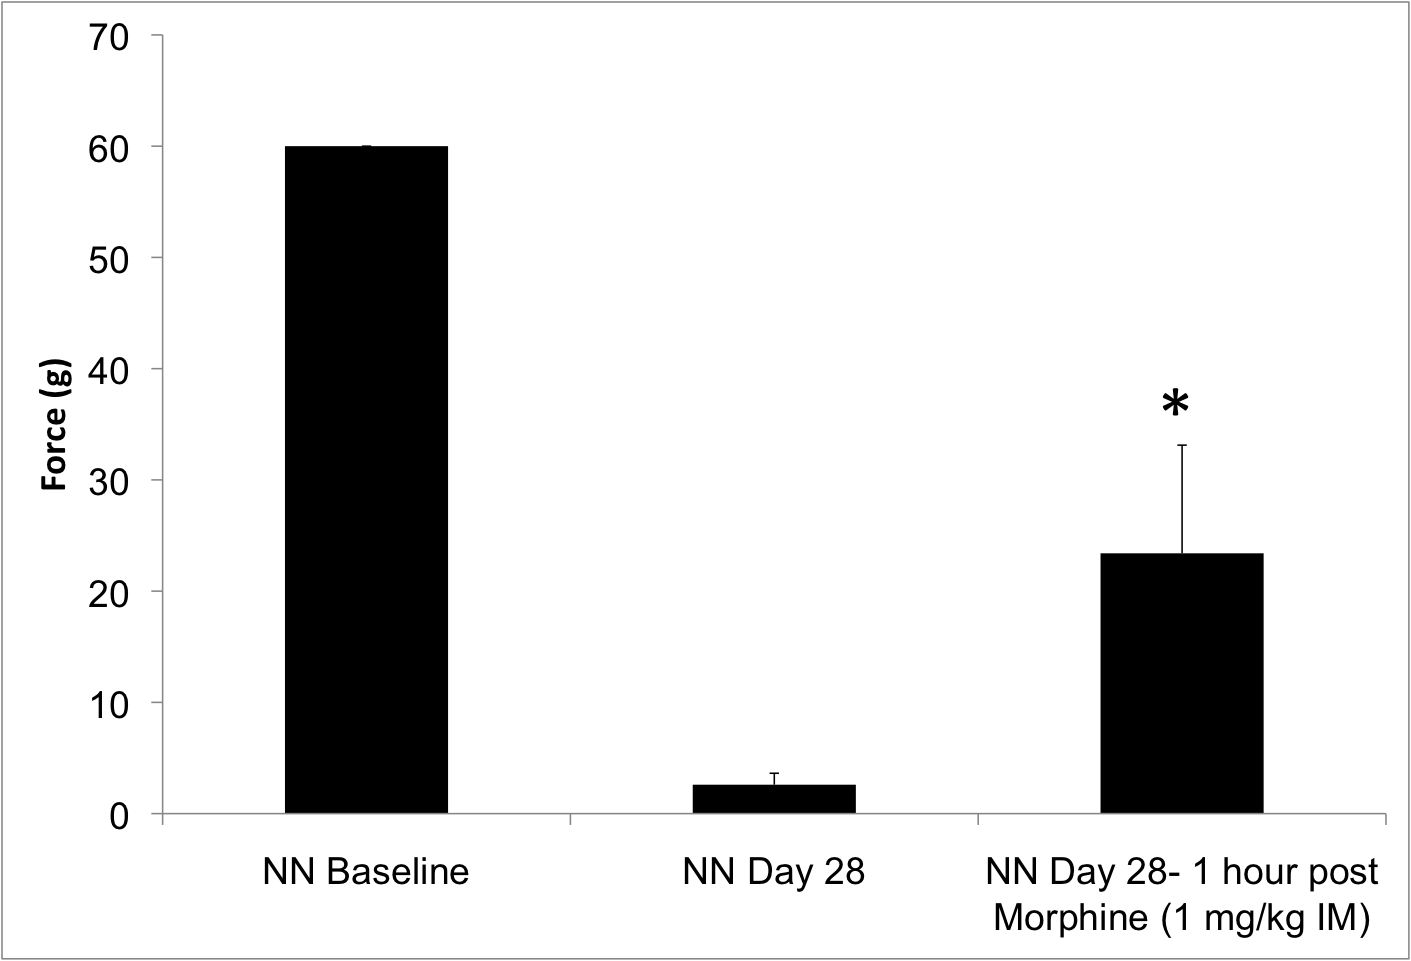 von frey in the neuritis neuropathy due to sciatic nerve injury in the pigs